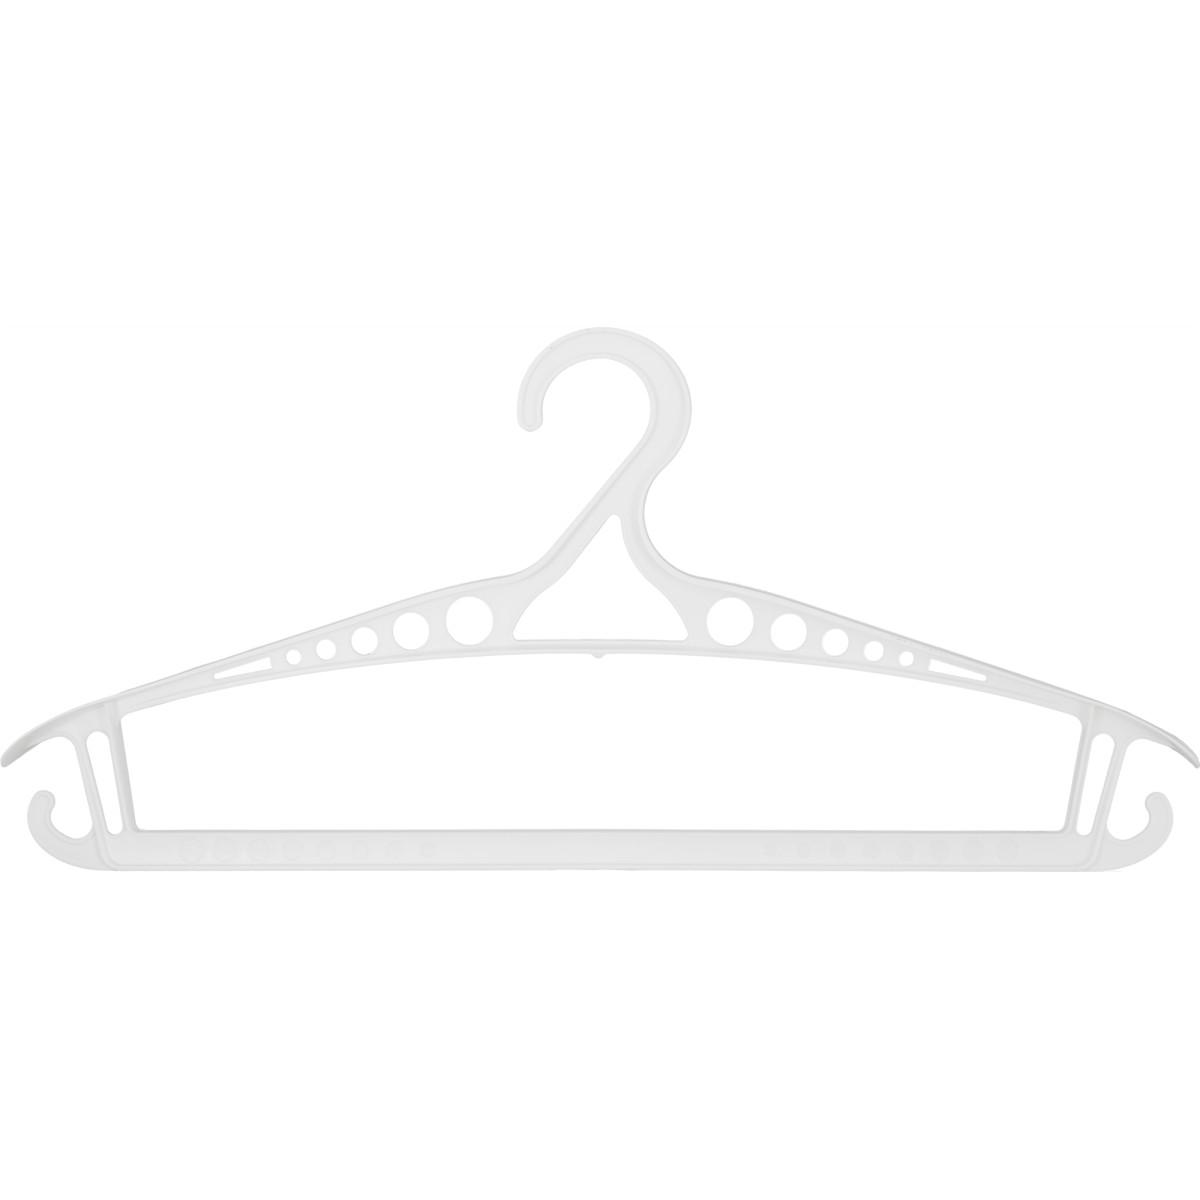 Плечики размер 48-50 425x188x32 мм полипропилен цвет белый